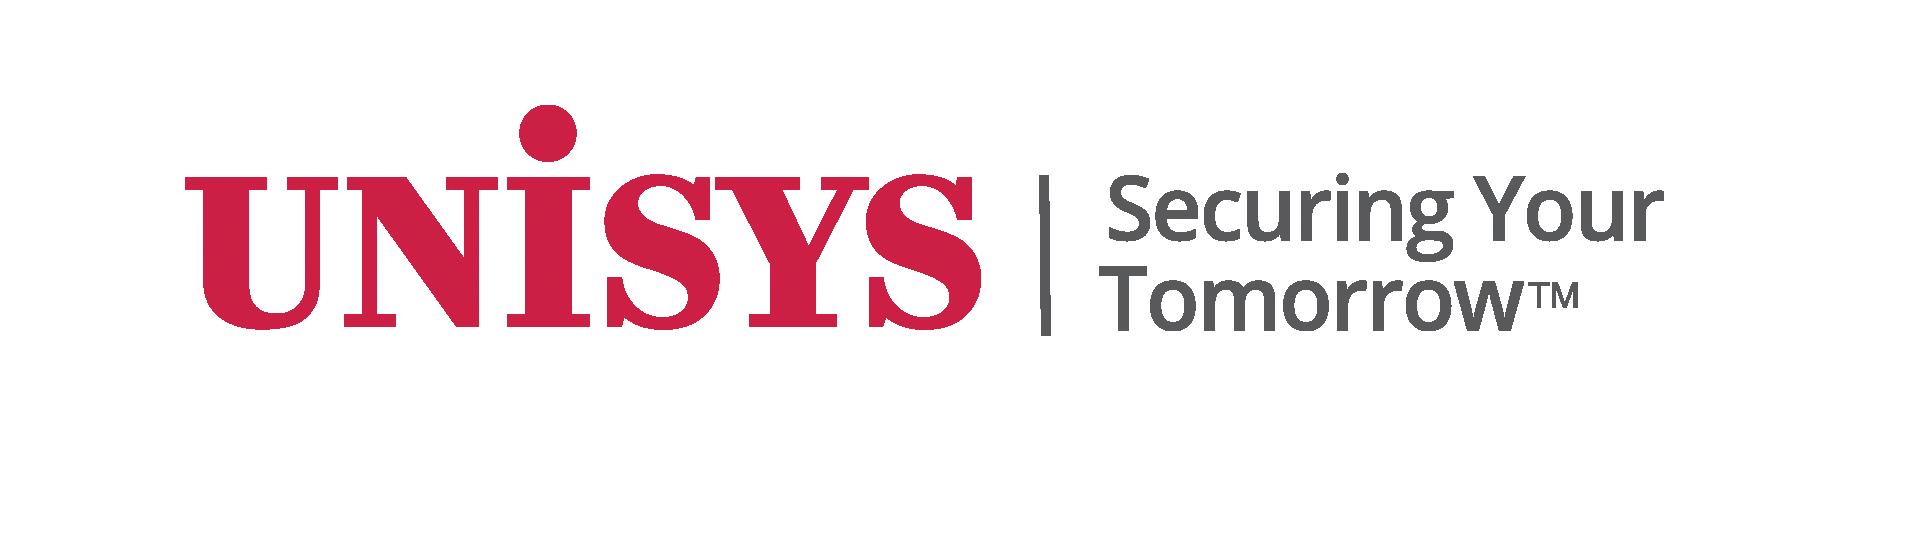 Unisys stopboris Image collections